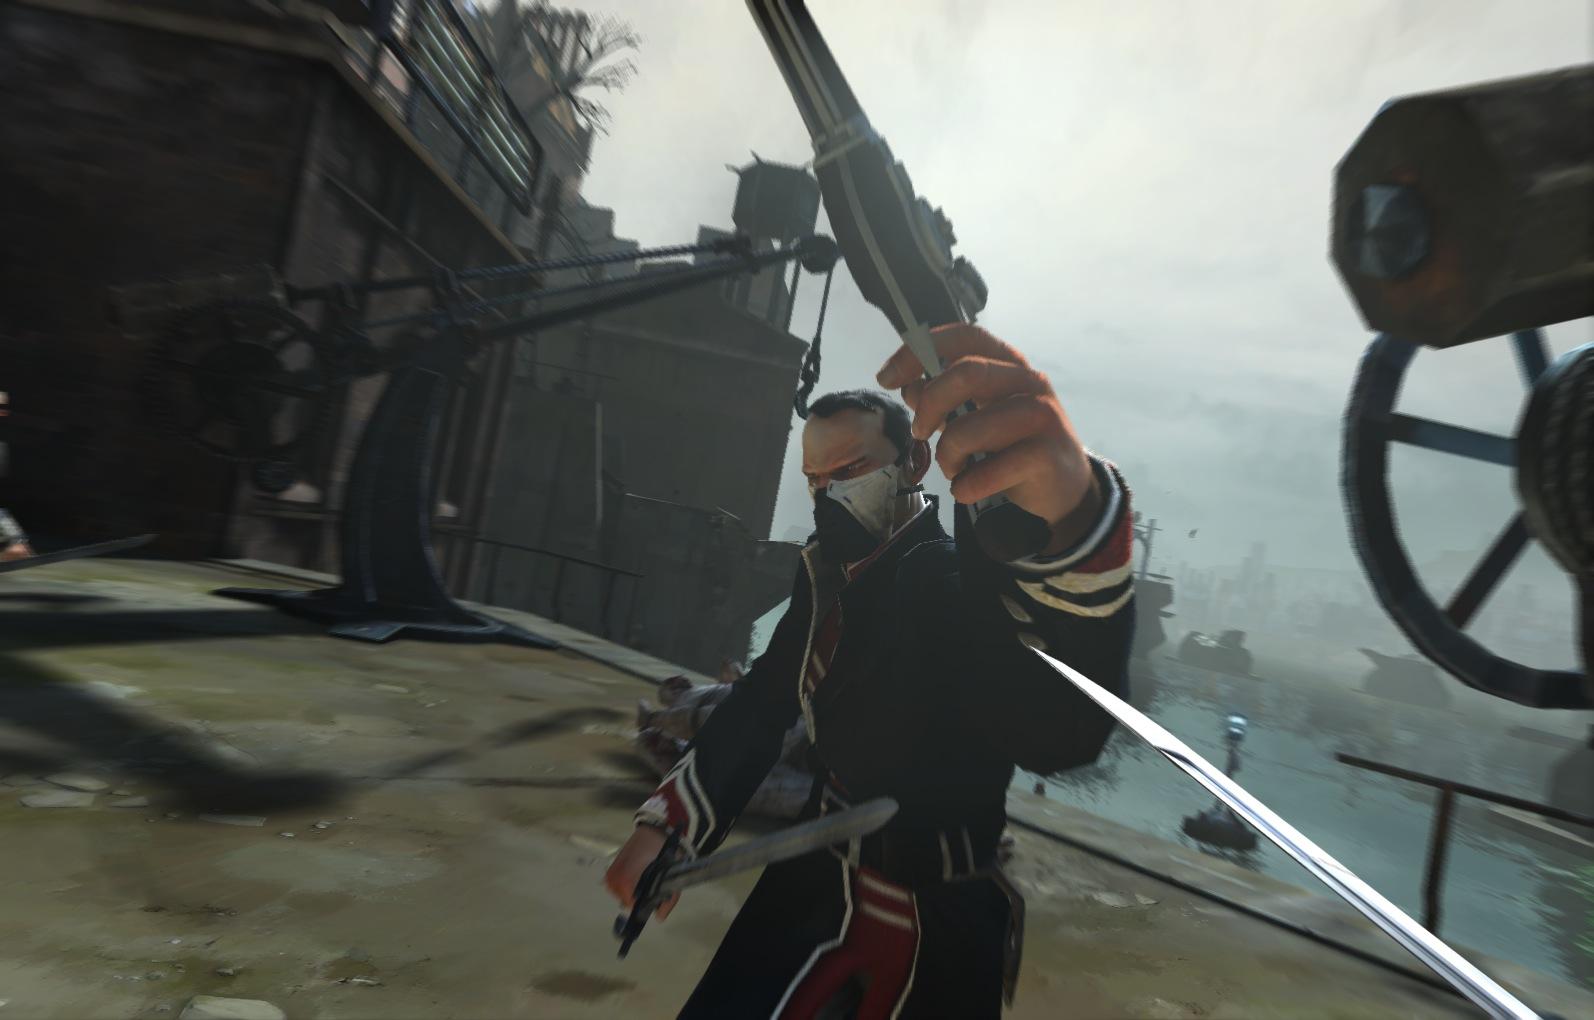 Revelado primeros detalles de Dishonored y una screenshot